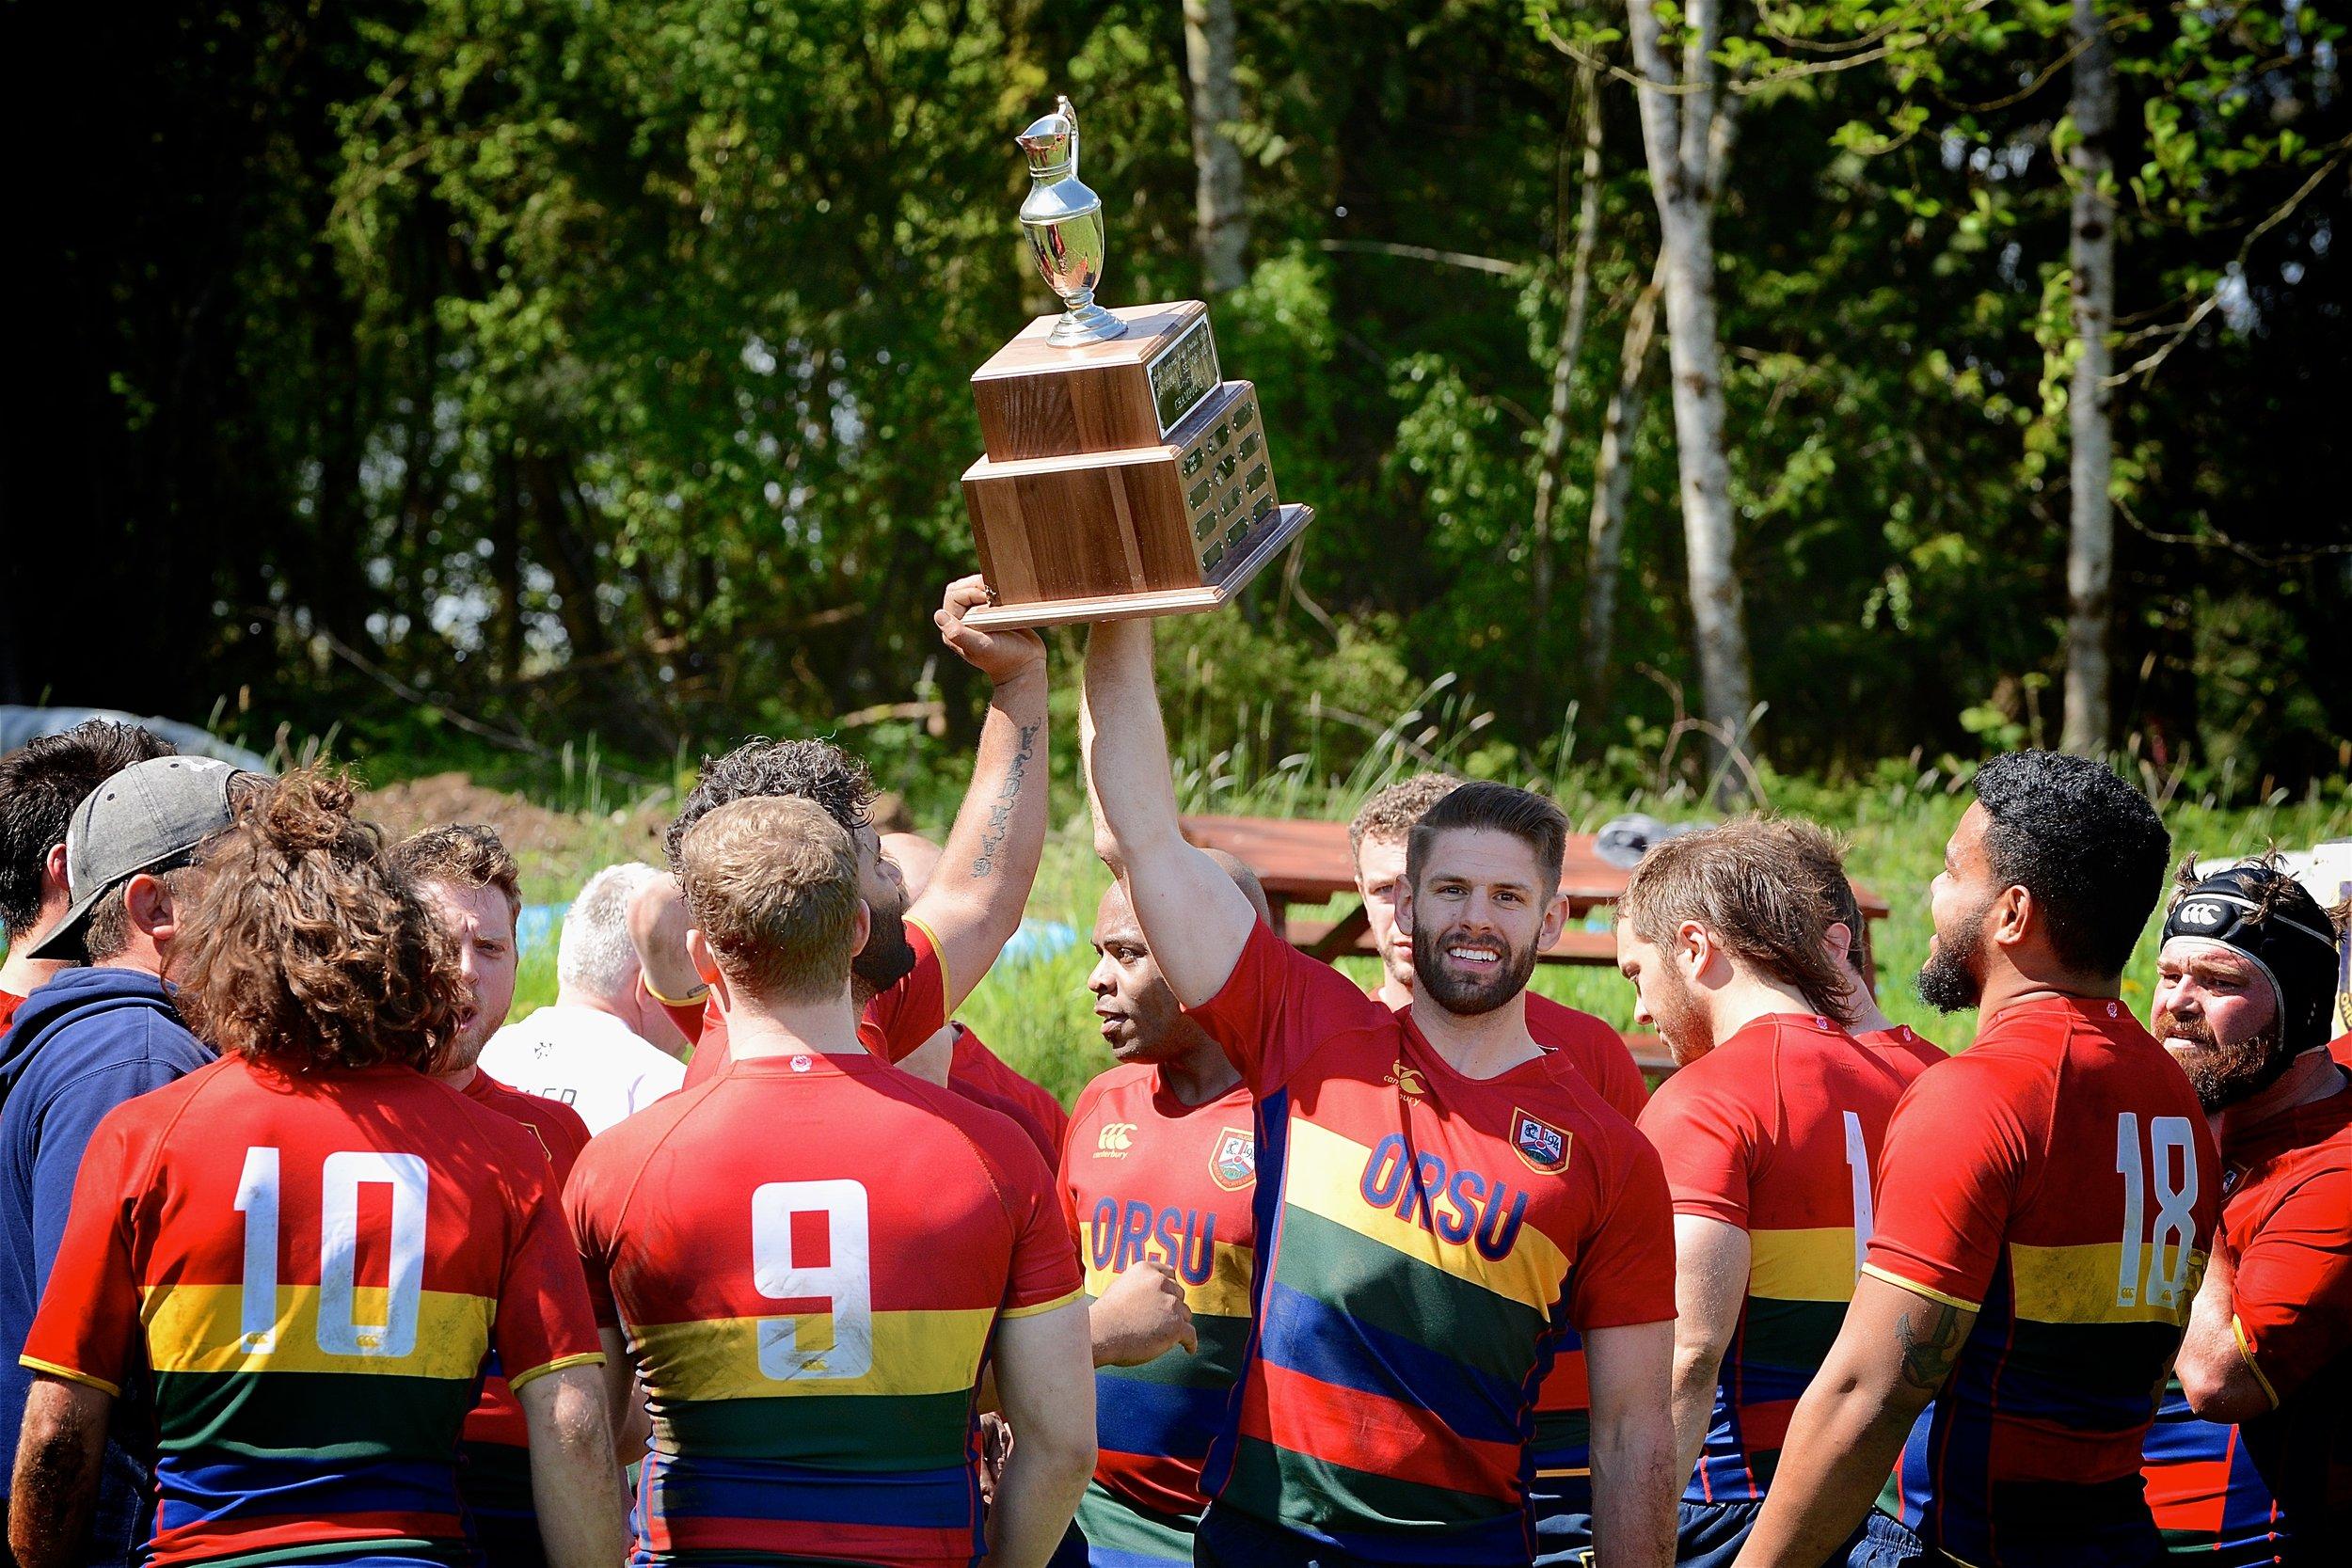 Join-ORSU-Rugby-Portland.jpg